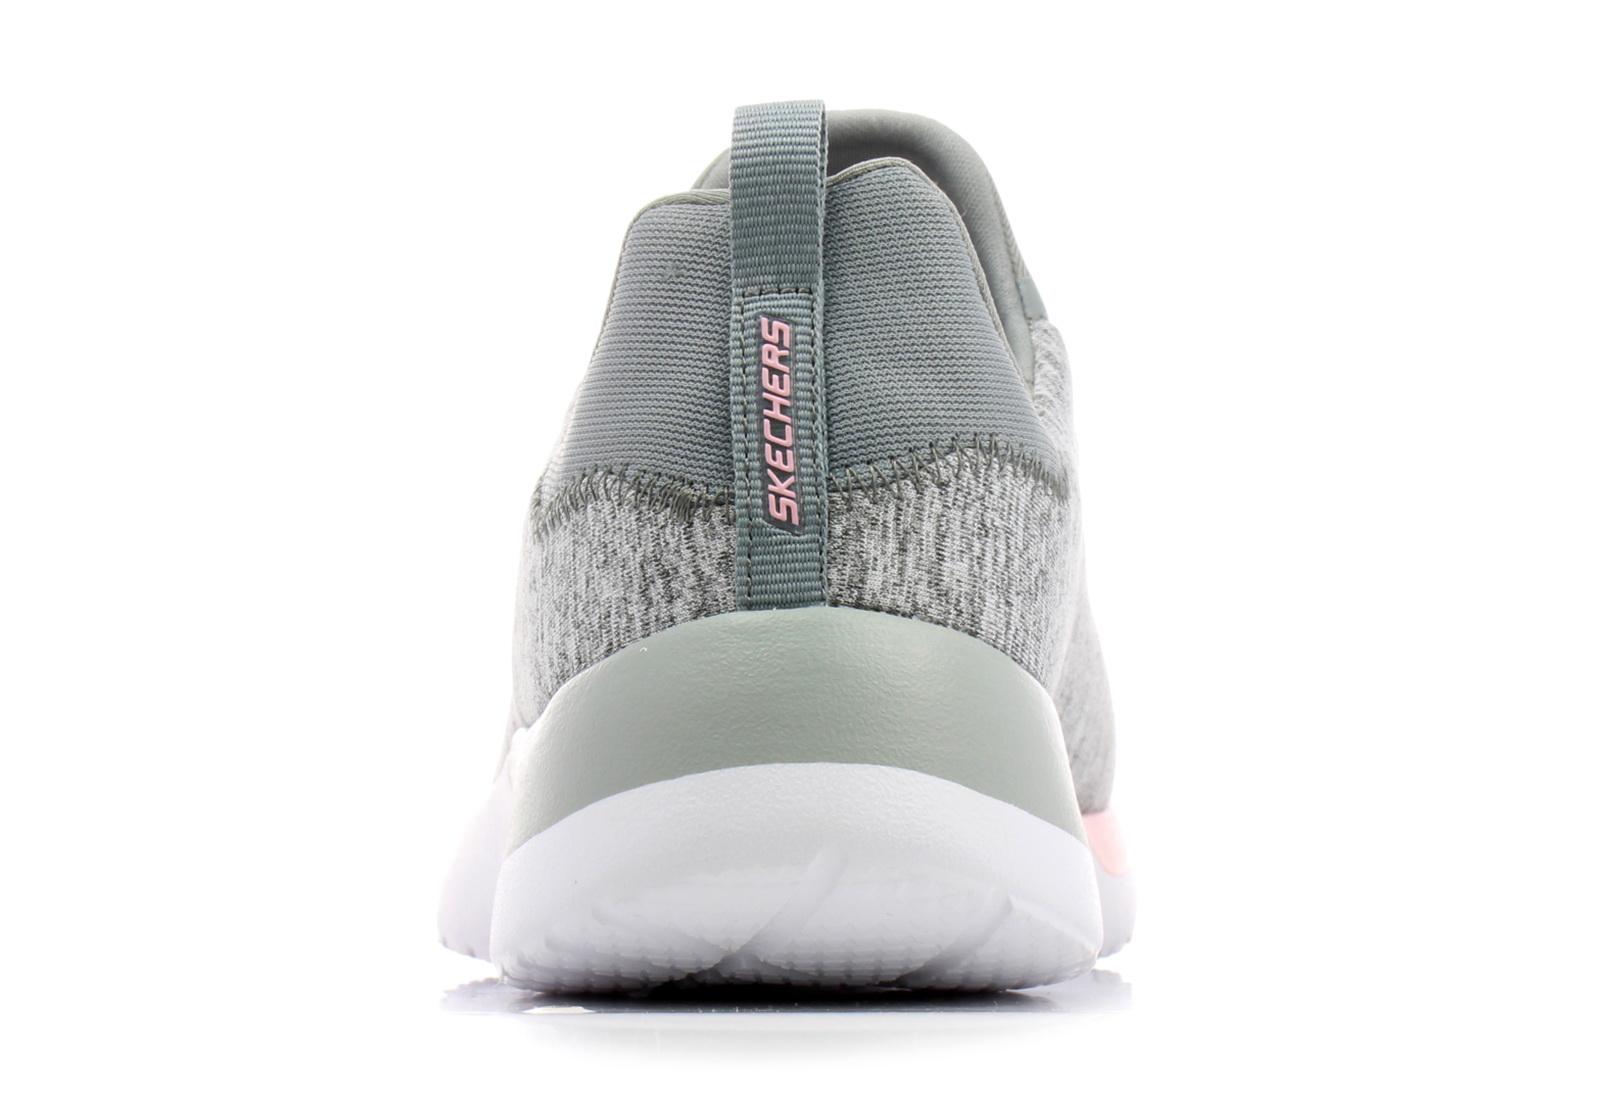 2b47191d8a36 Skechers Cipő - Dynamight - Breakthrough - 12991-gylp - Office Shoes ...